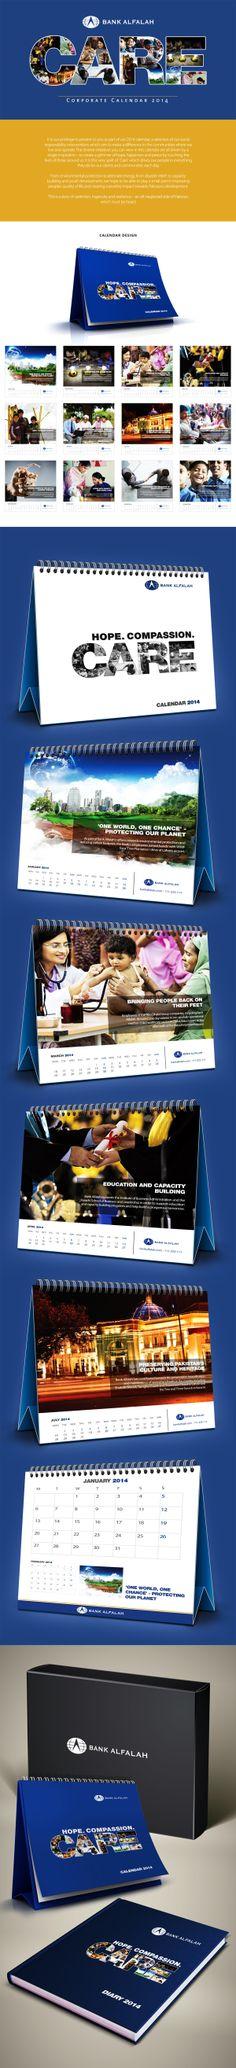 Alfalah Corporate Calendar 2014 by Muhammad Moazzam, via Behance